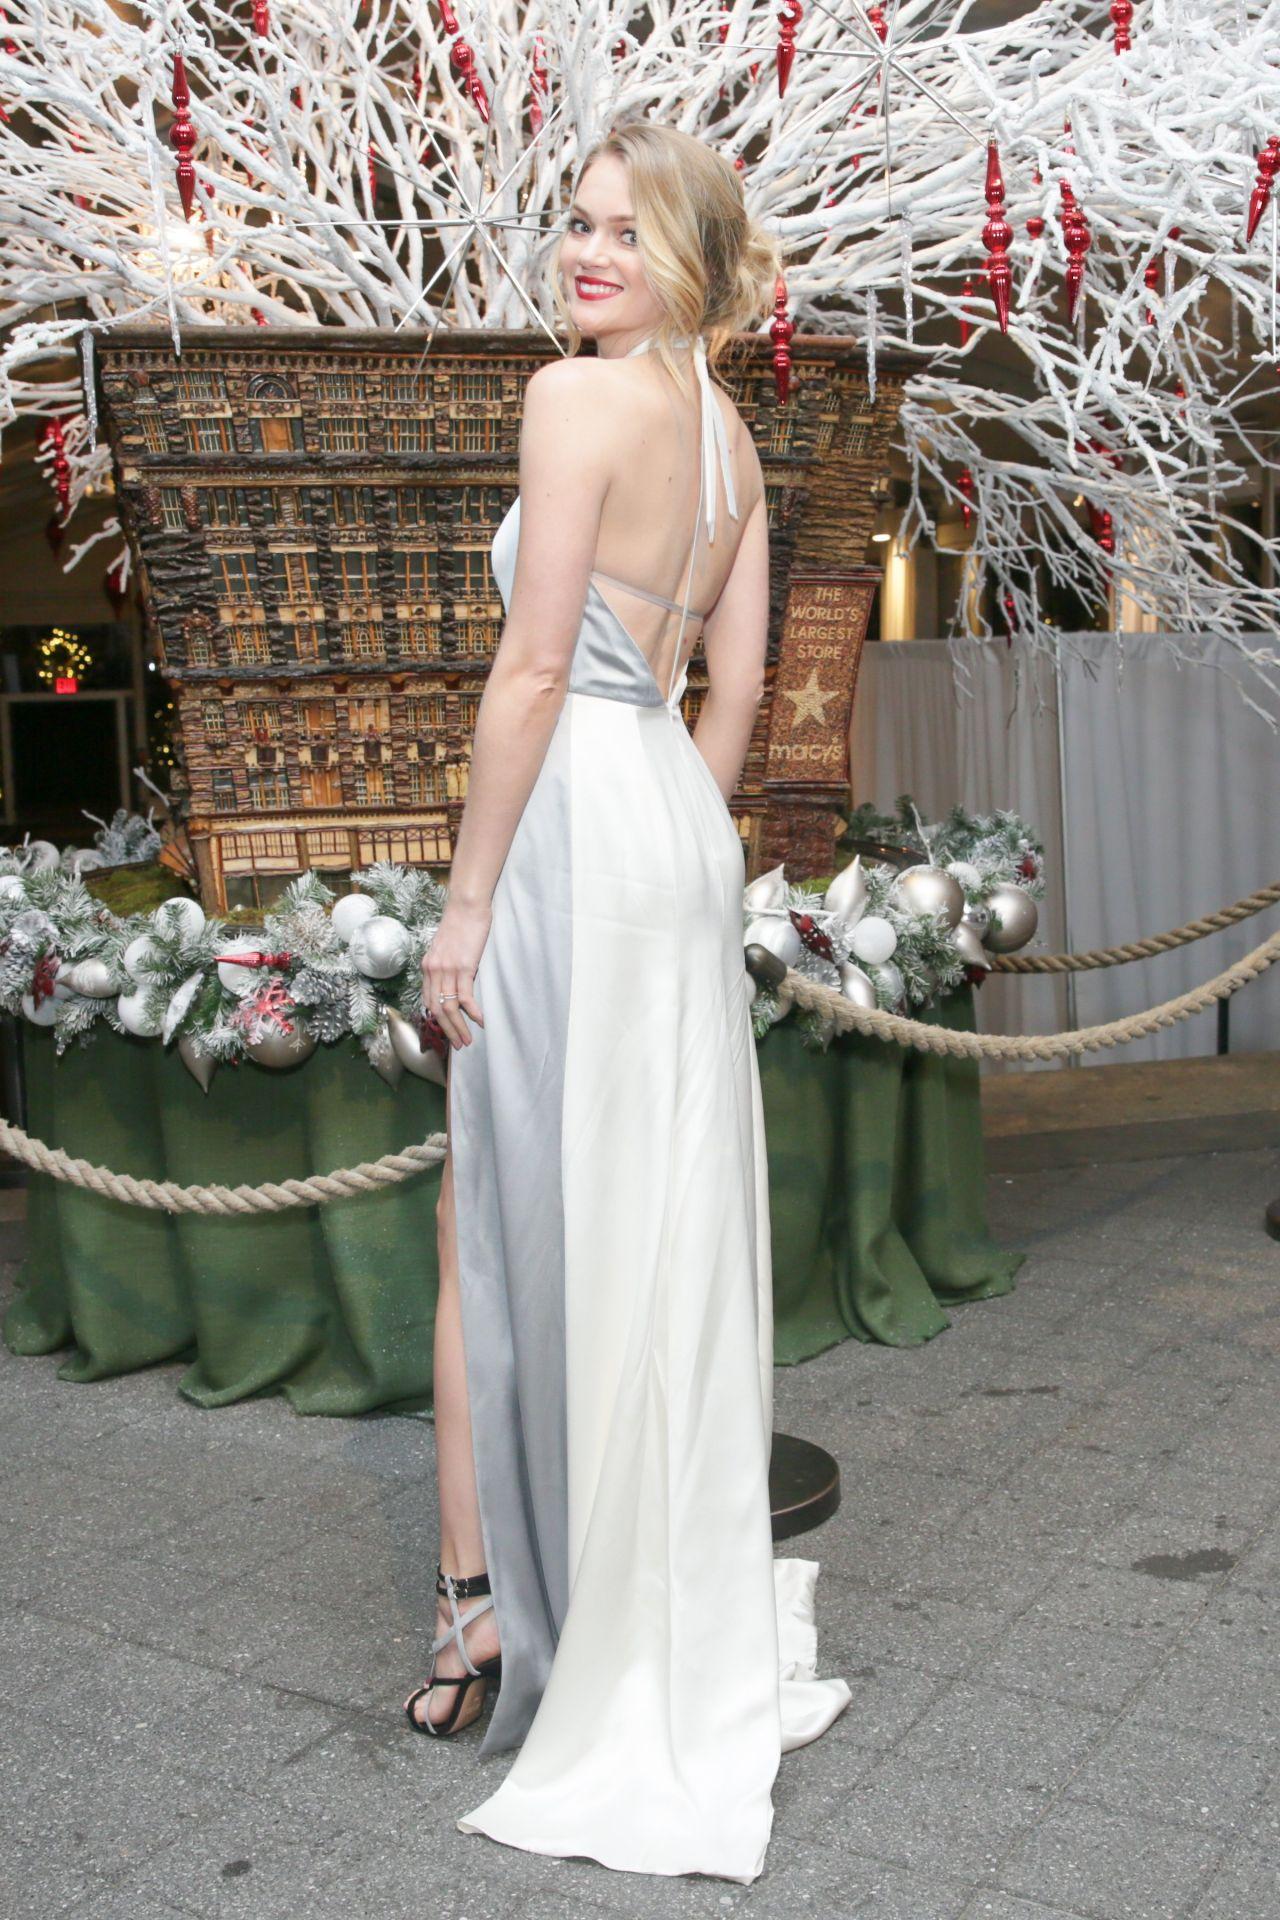 Lindsay Ellingson Winter Wonderland Ball in Bronx